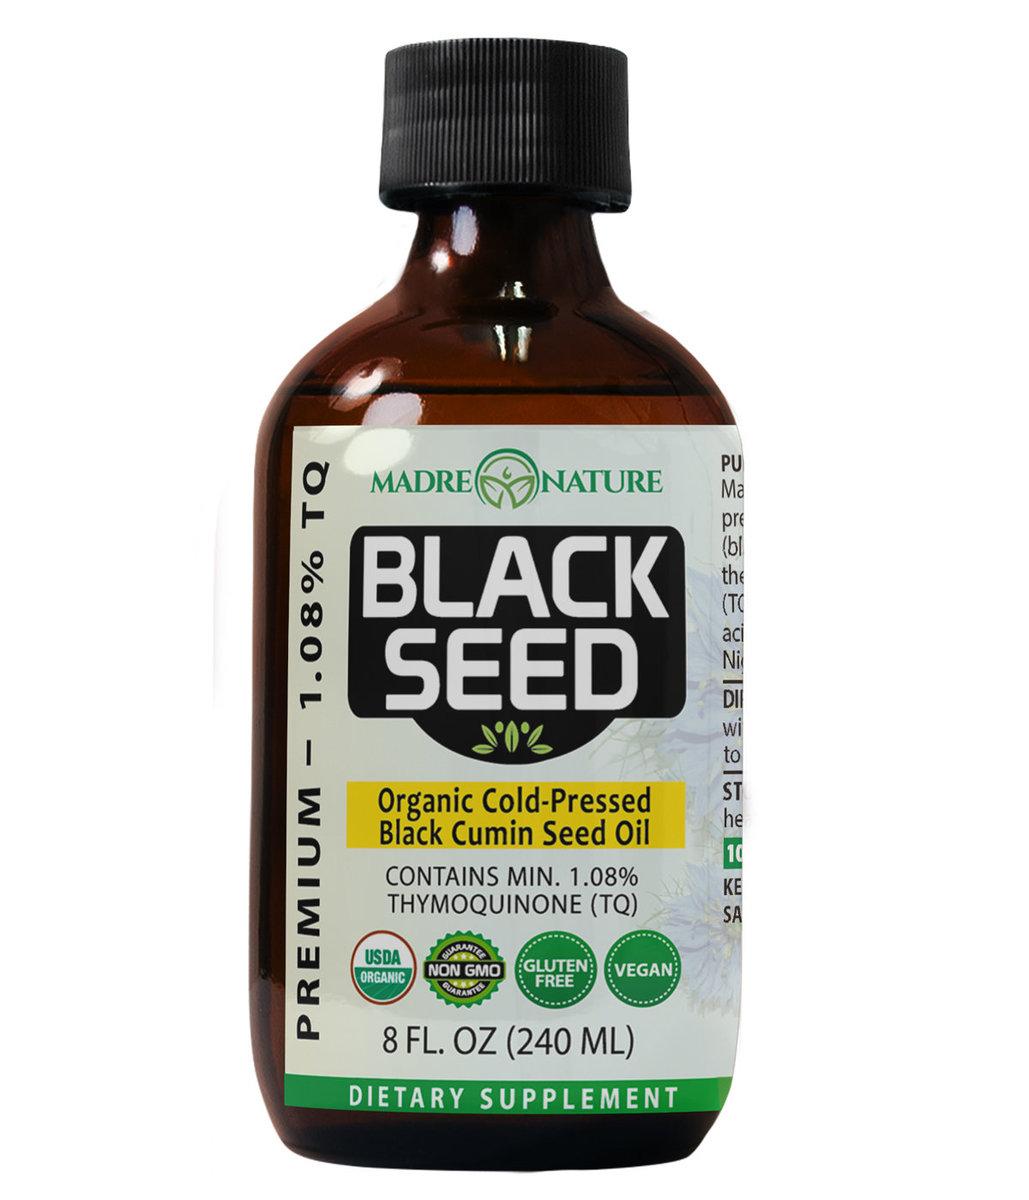 Madre Nature Orgainc Cold-Pressed Black Cumin Seed Oil 8oz